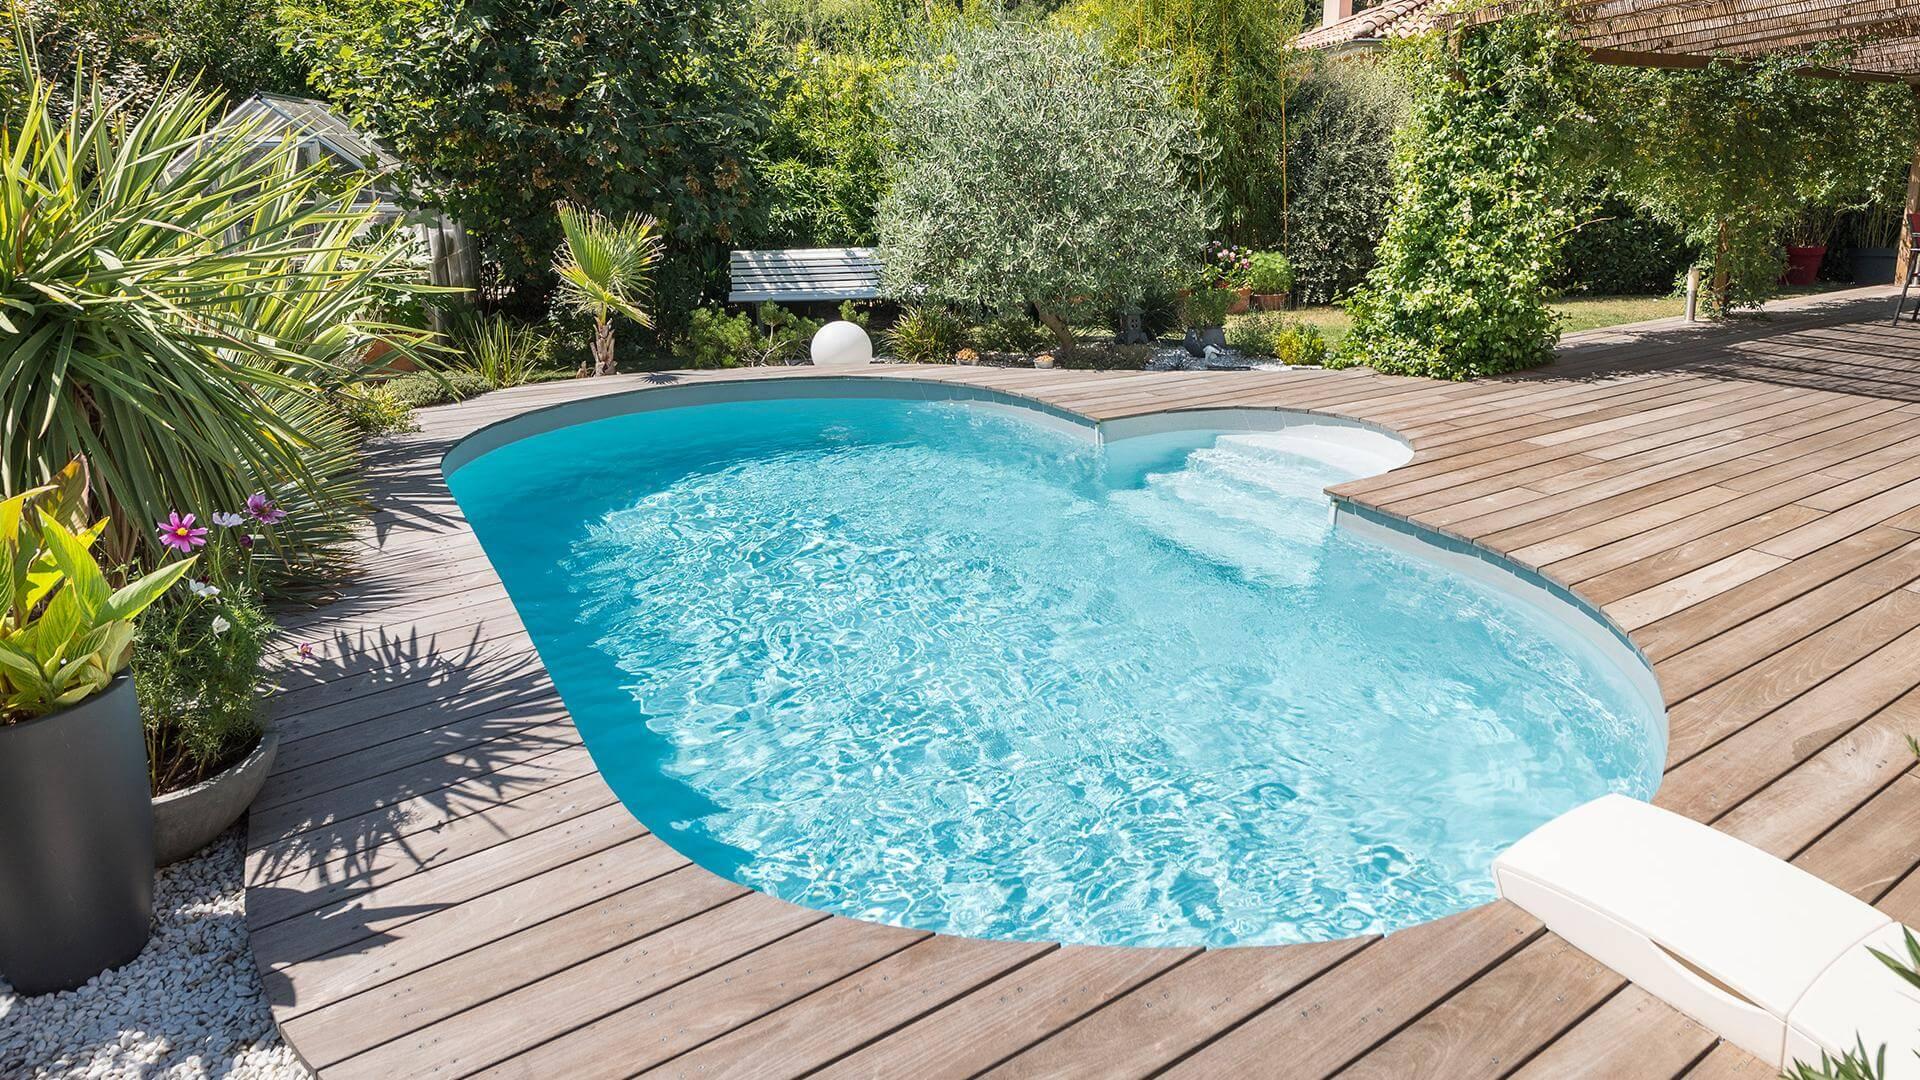 Prix Piscine Aquilus Mini Water piscine ovale olivia : l'espace de nage idéal   piscines